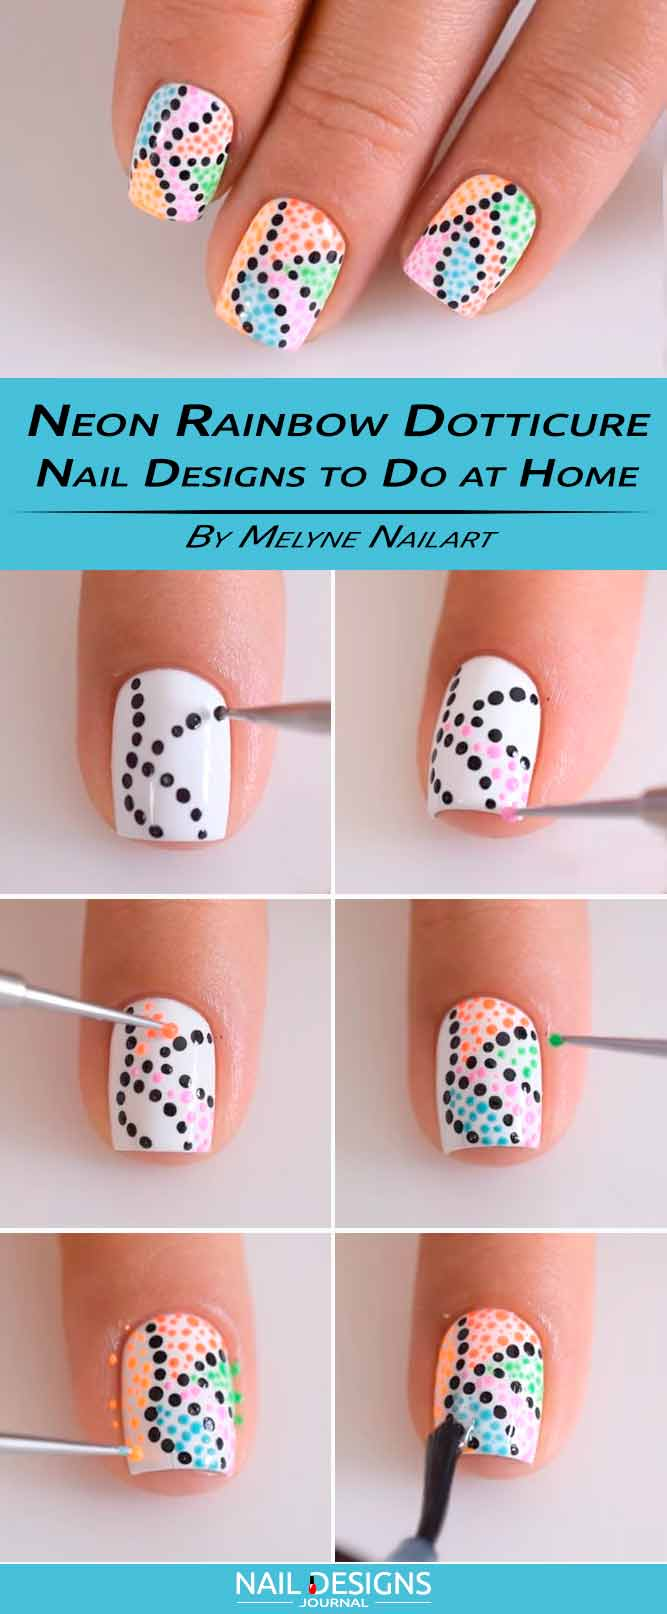 Neon Rainbow Dotticure Nail Designs